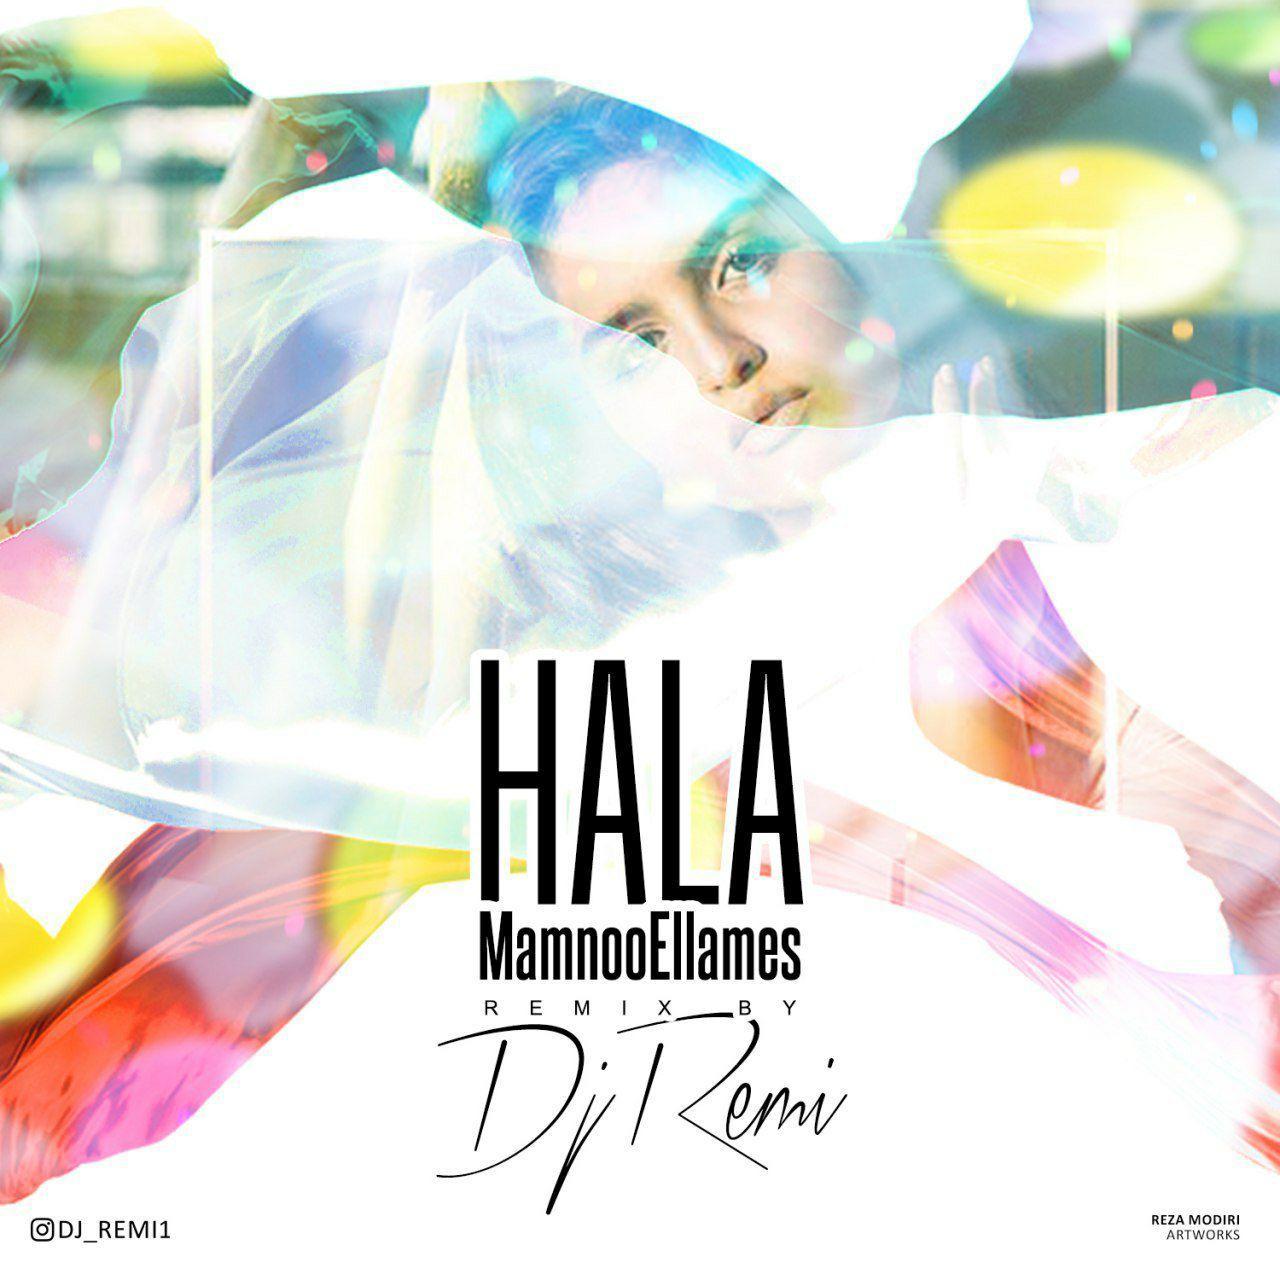 Mamnoo Ellames – Hala (DJ Remi remix)